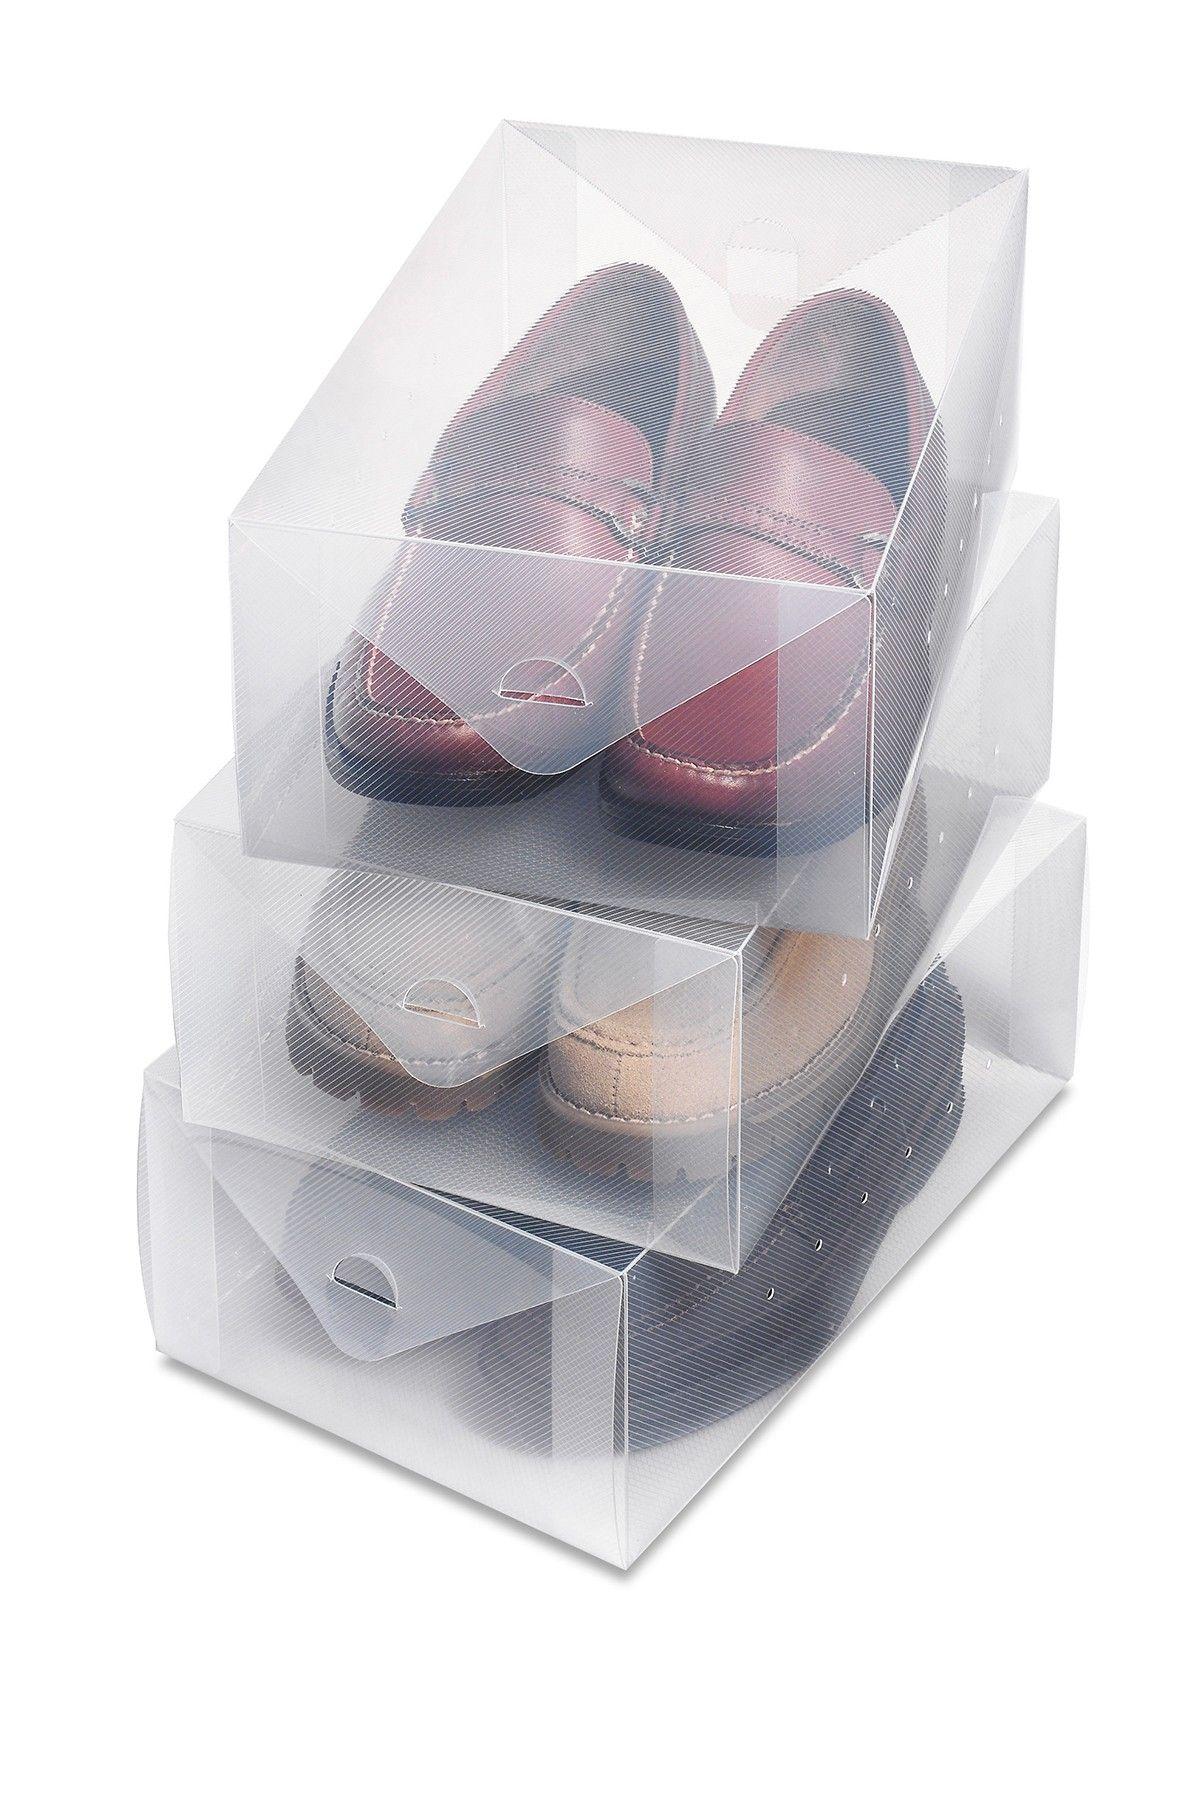 Clear Vue Shoe Boxes - Set of 3 on @HauteLook